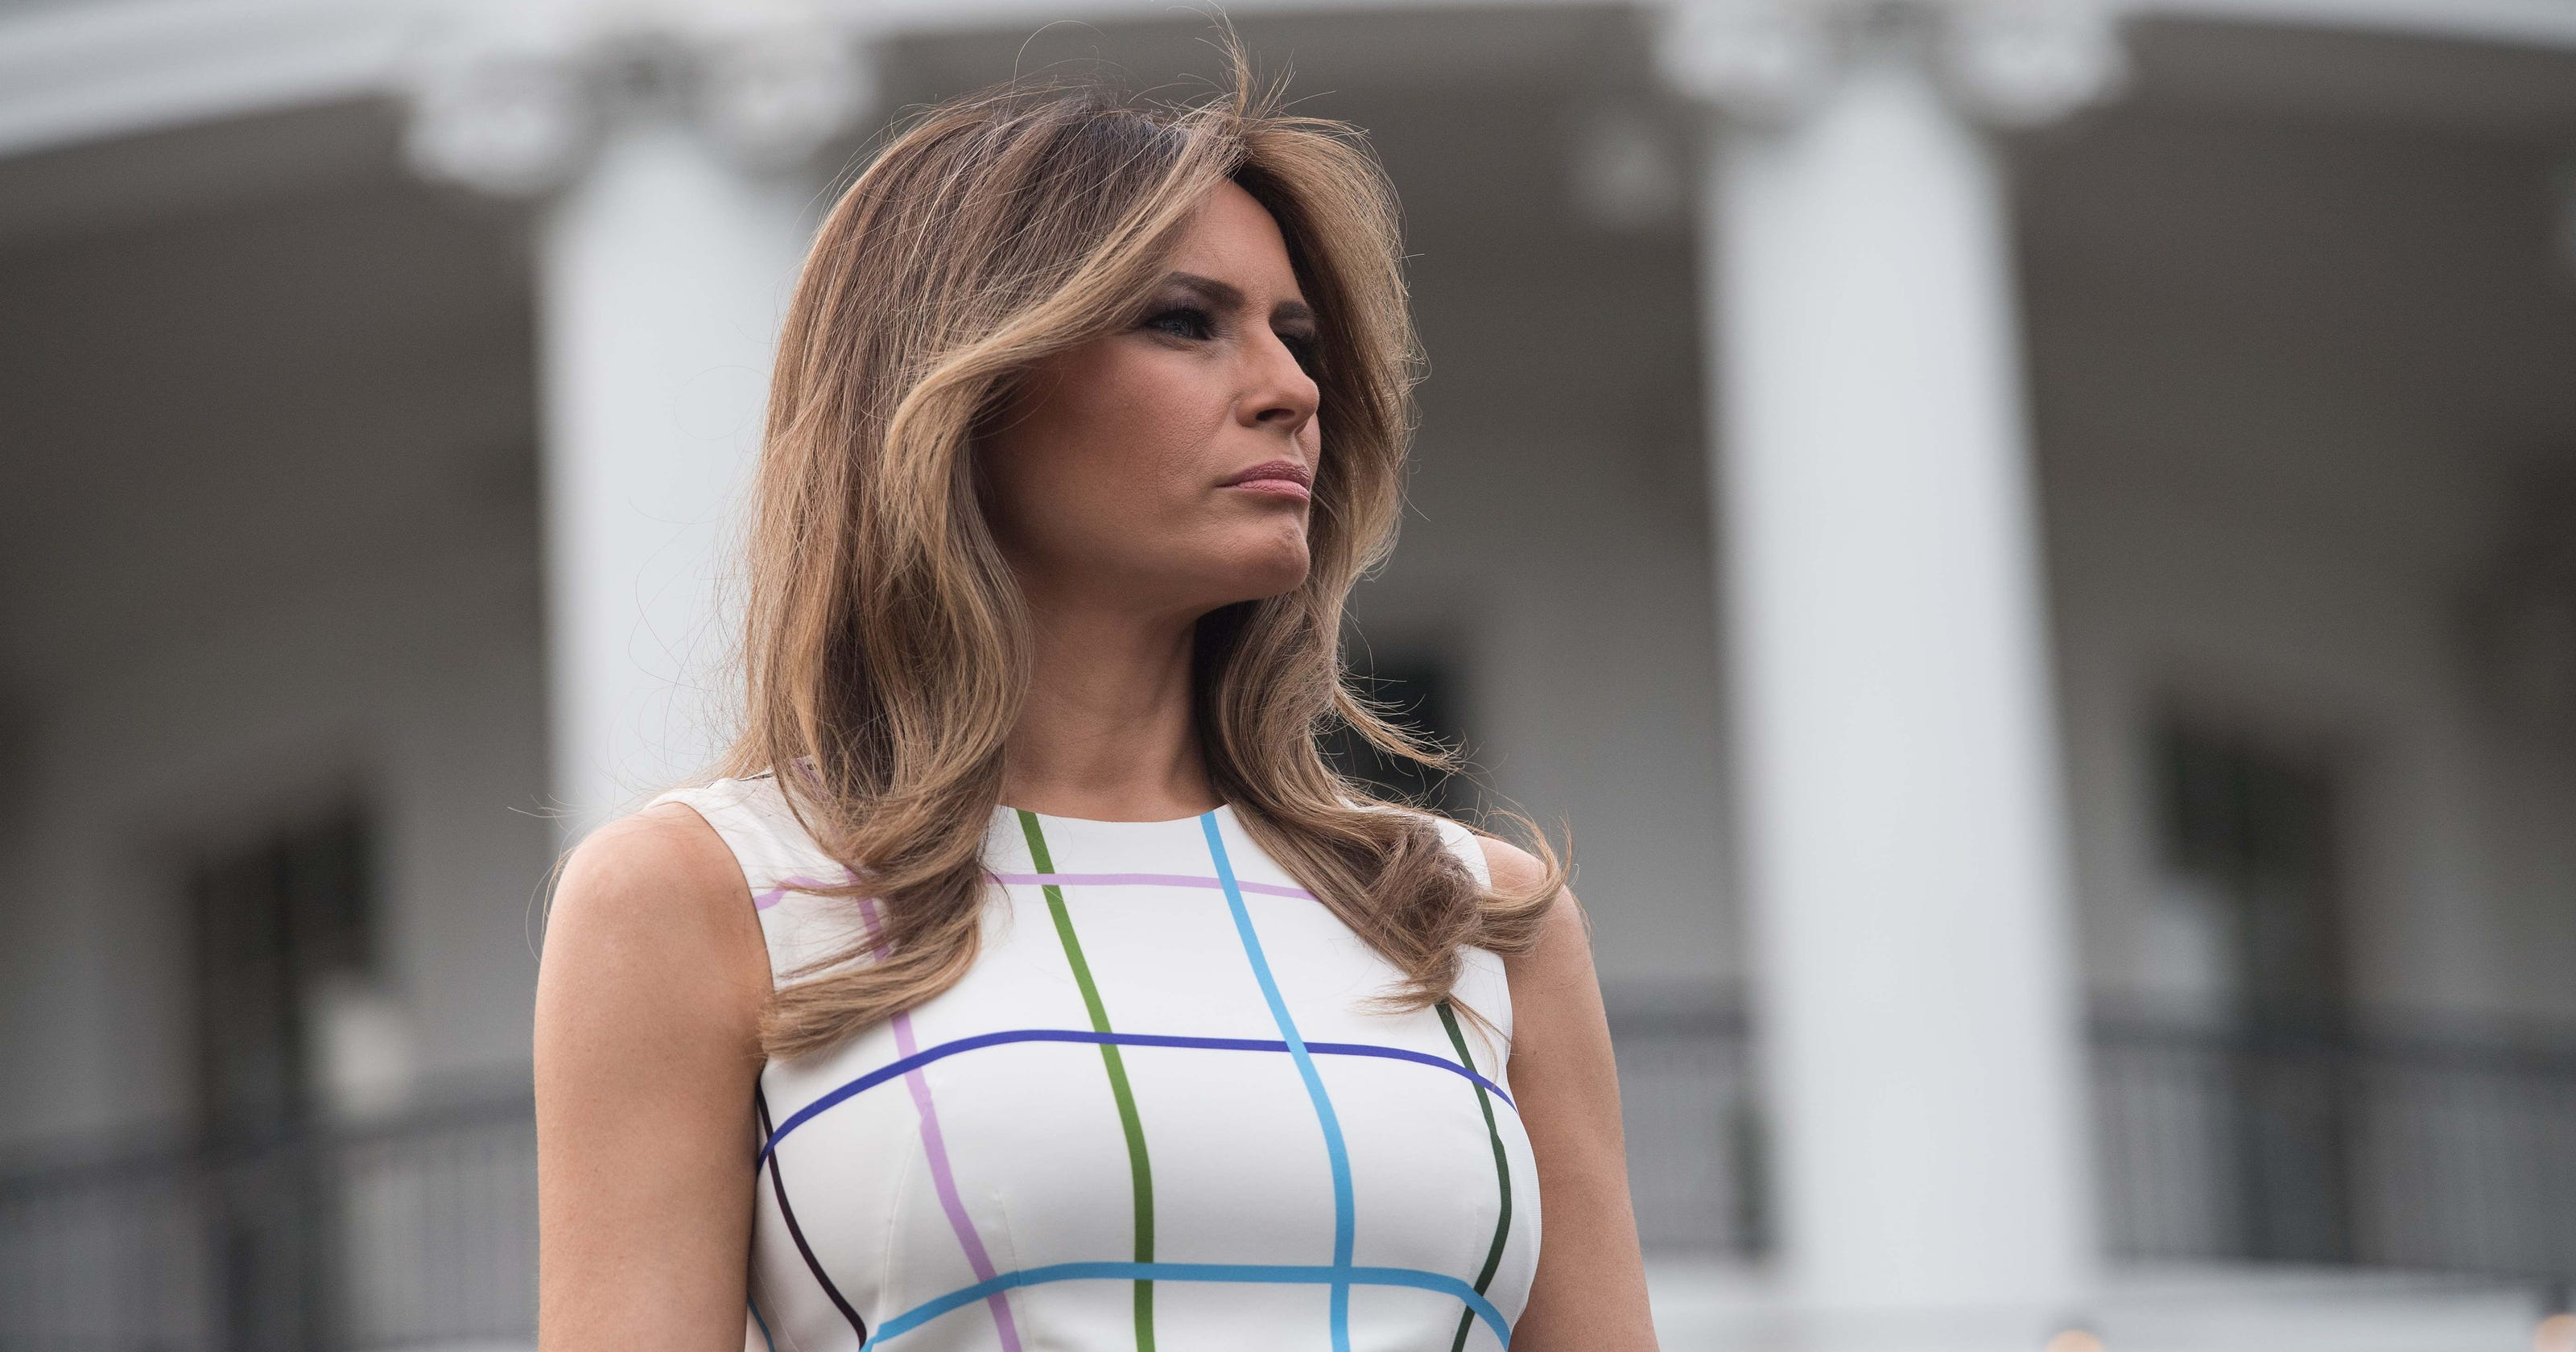 d9661ba251c Melania Trump sports Mary Katrantzou dress at Congressional Picnic